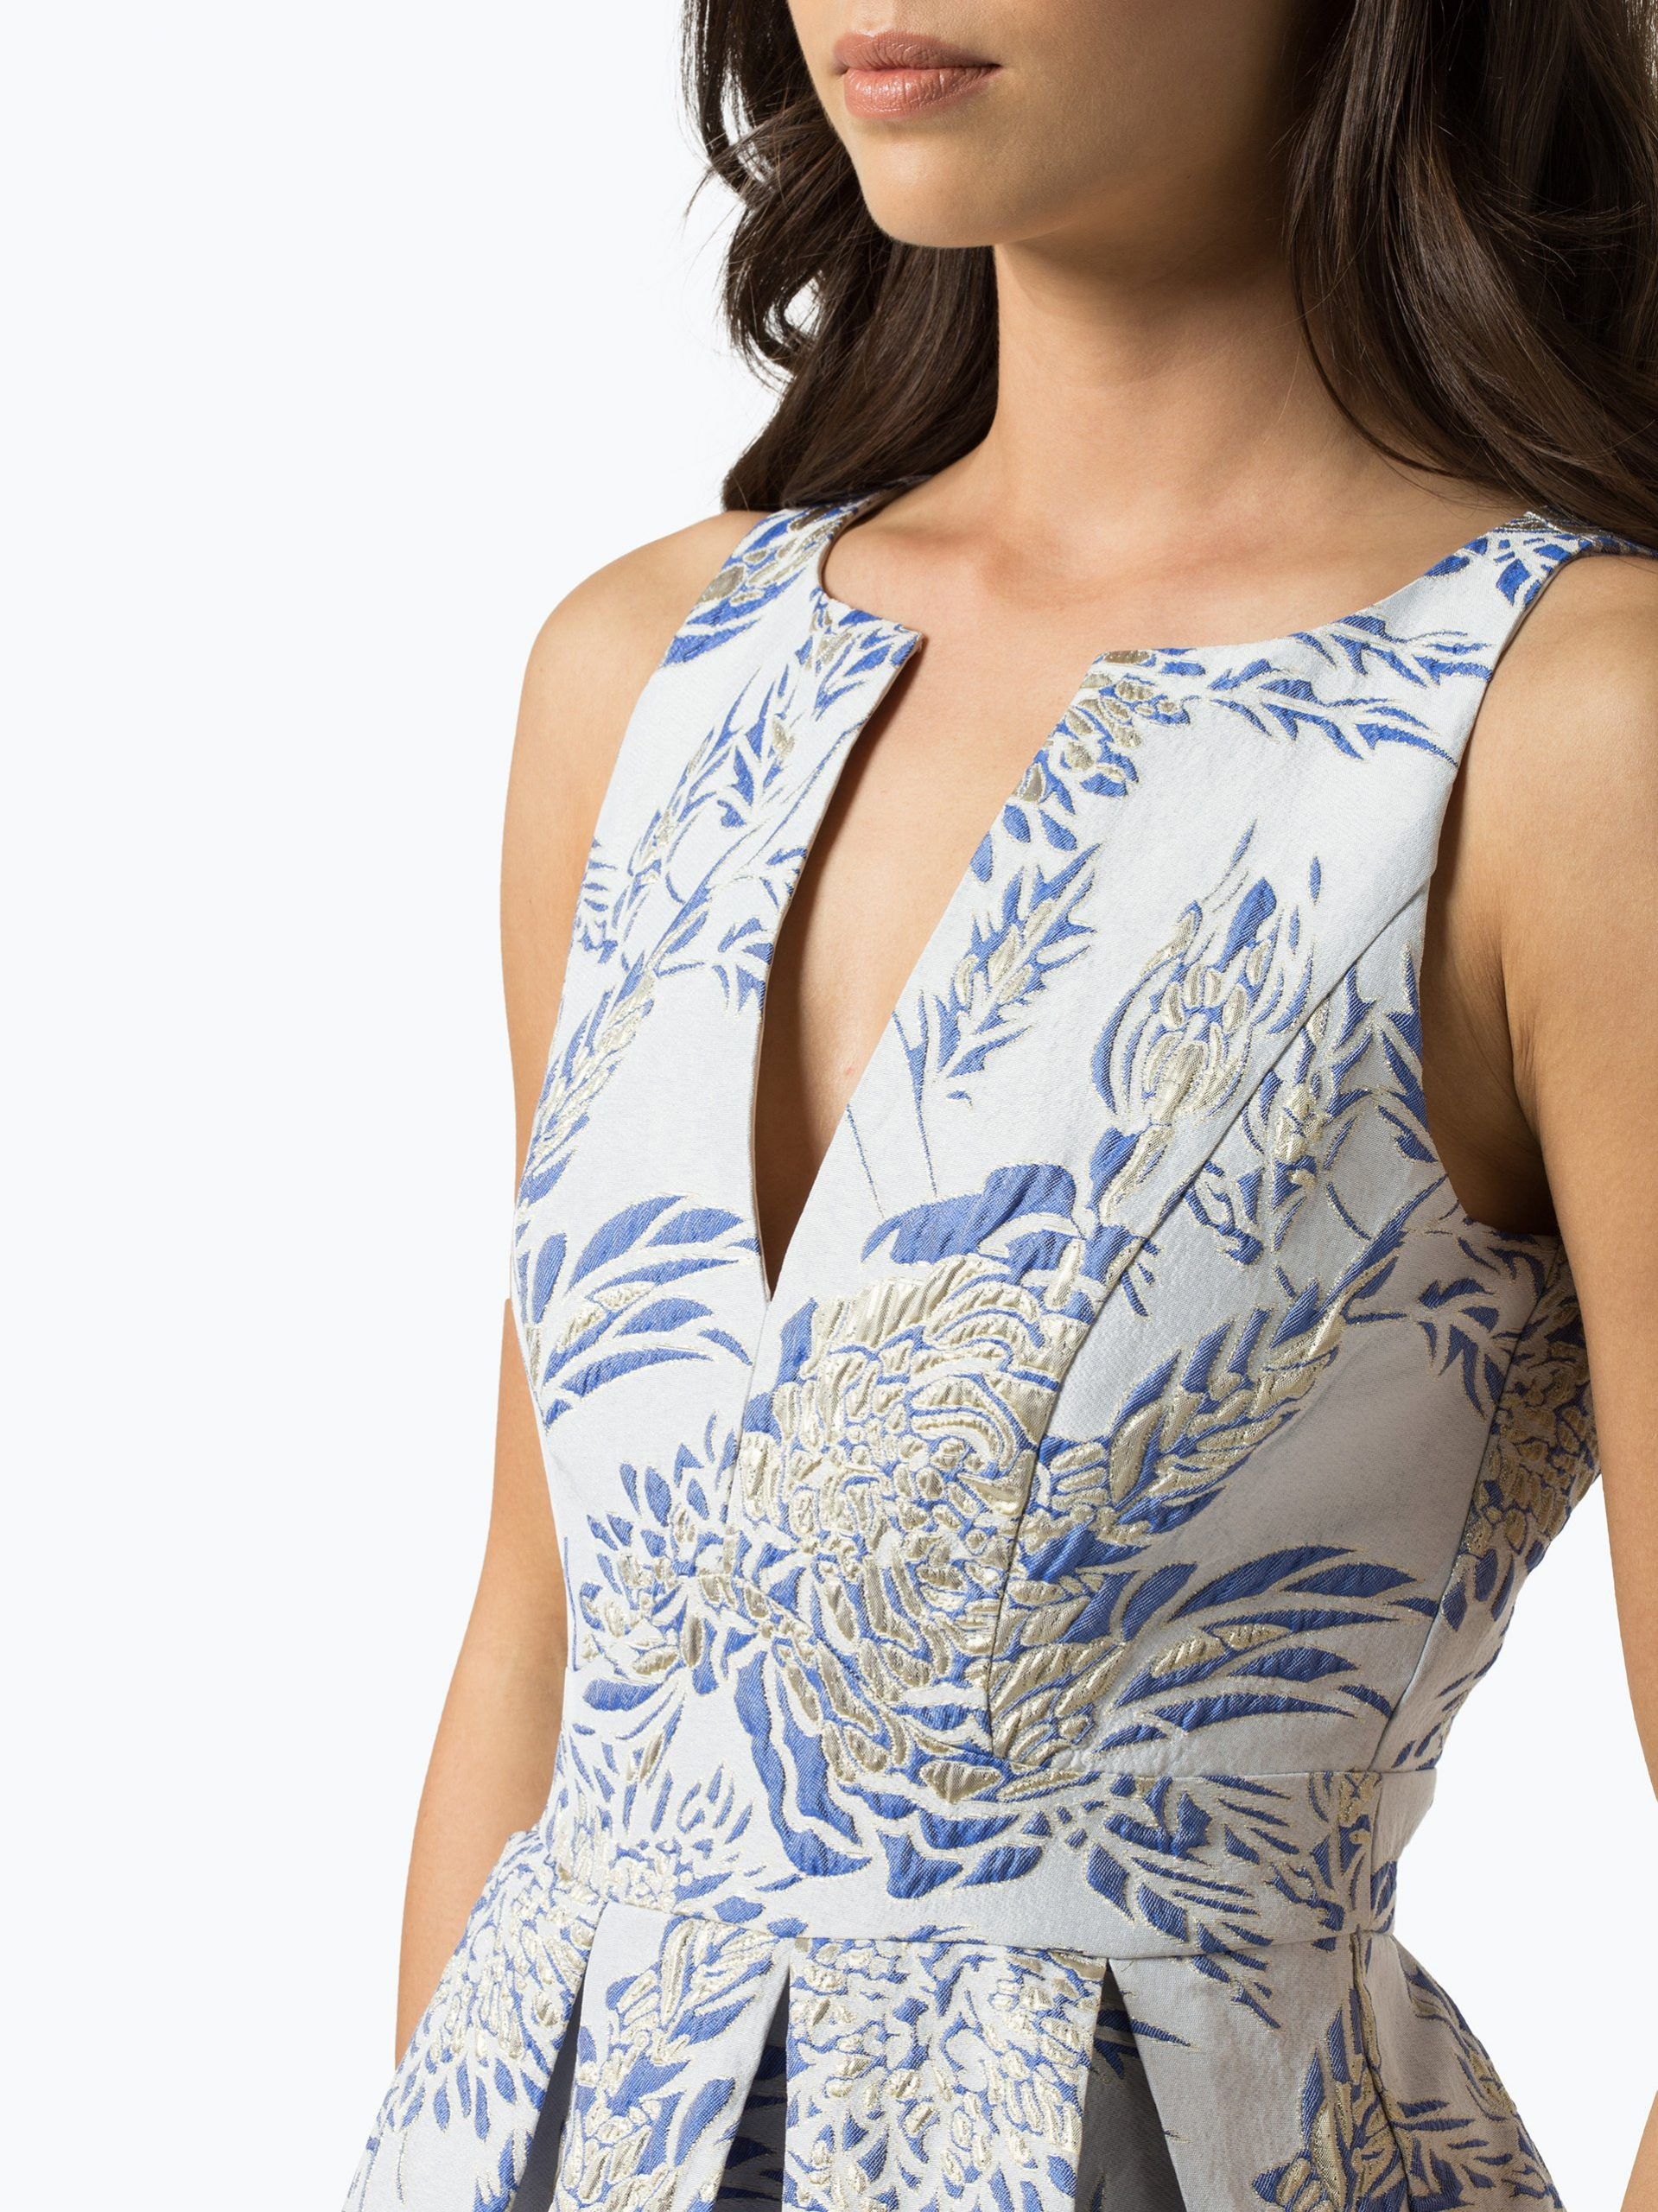 13 Coolste Yas Abendkleid Spezialgebiet17 Cool Yas Abendkleid Design